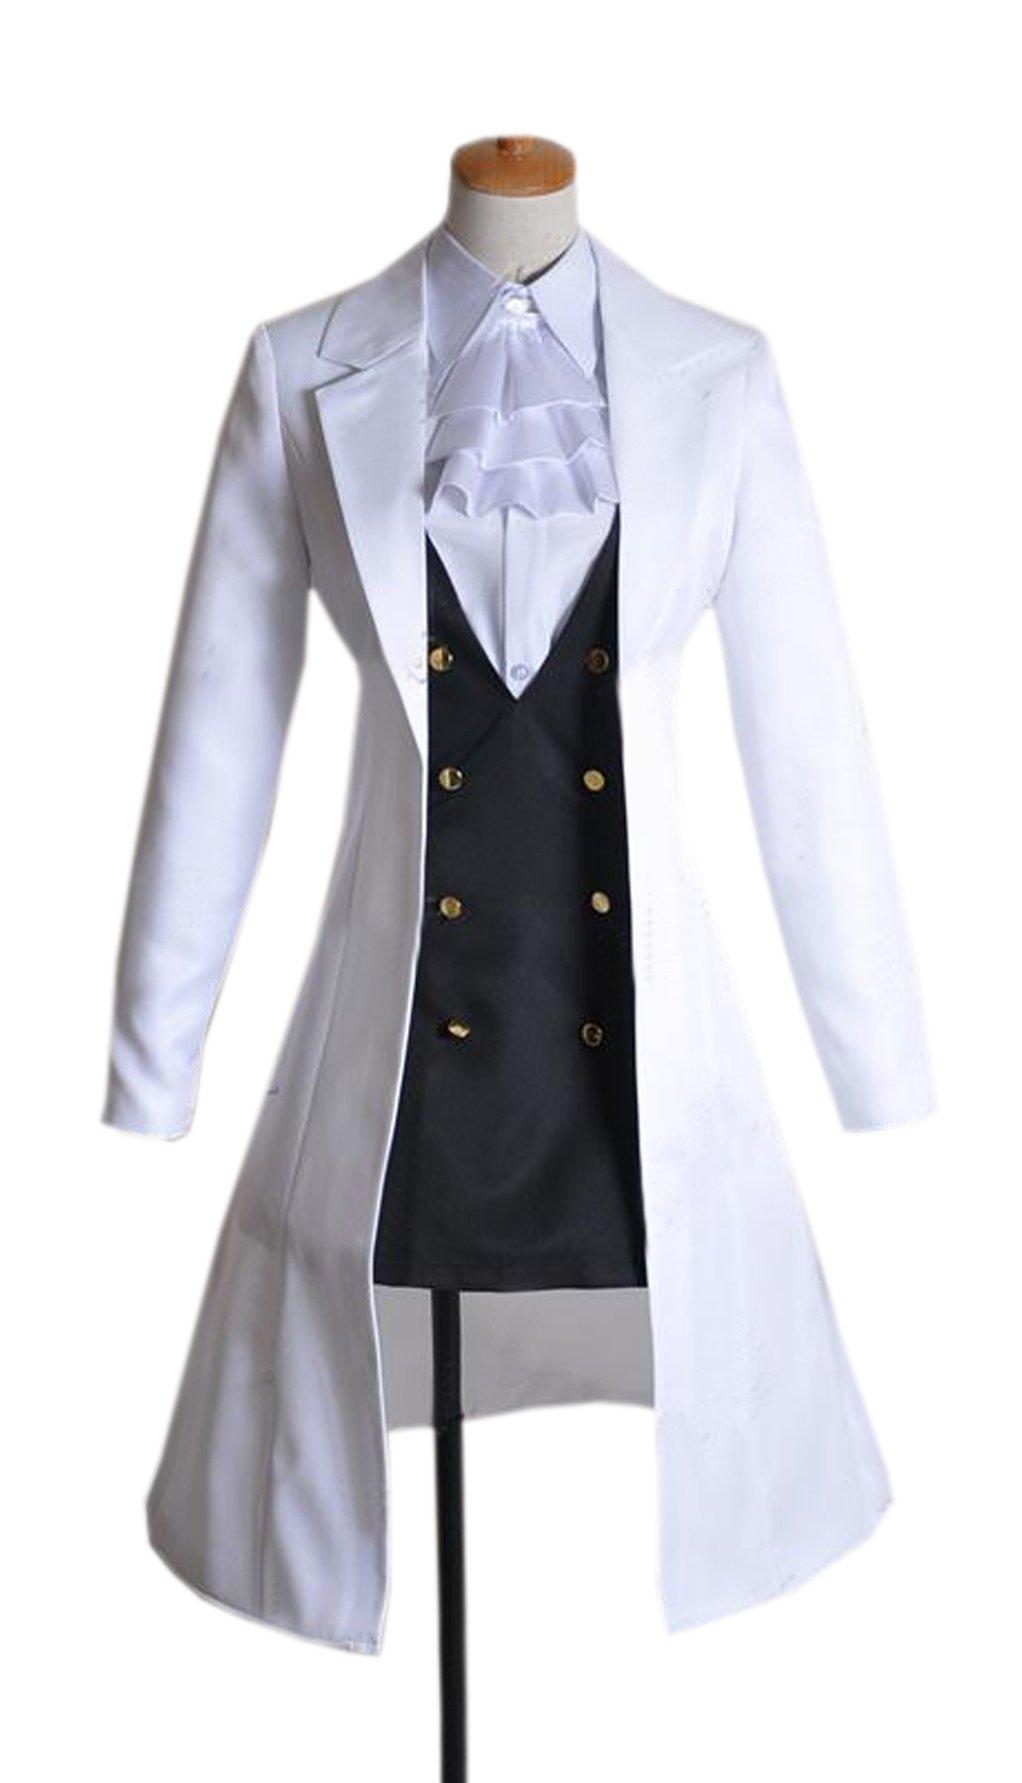 Dreamcosplay Anime Inu x Boku SS Ririchiyo Outfits Cosplay